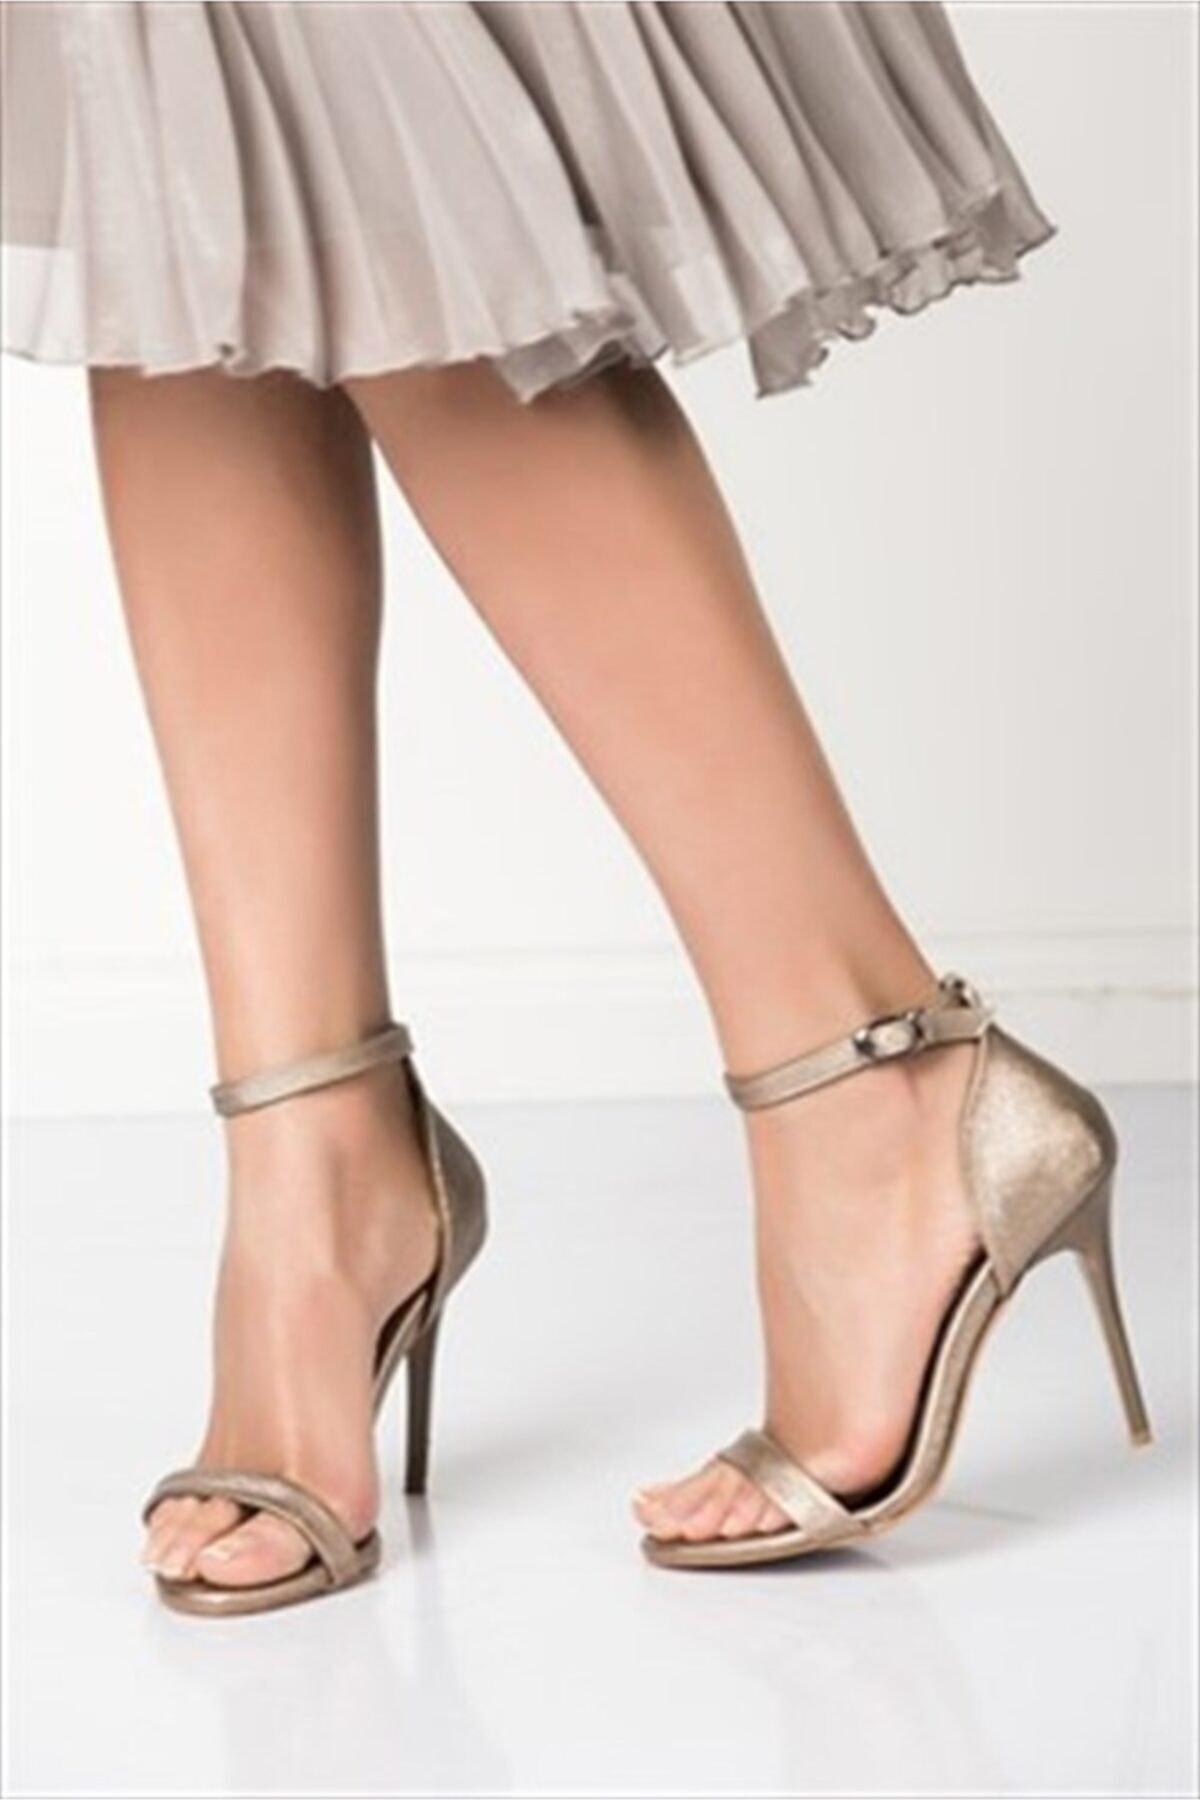 Fox Shoes Platin Kadın Topuklu Ayakkabı B922112609 1